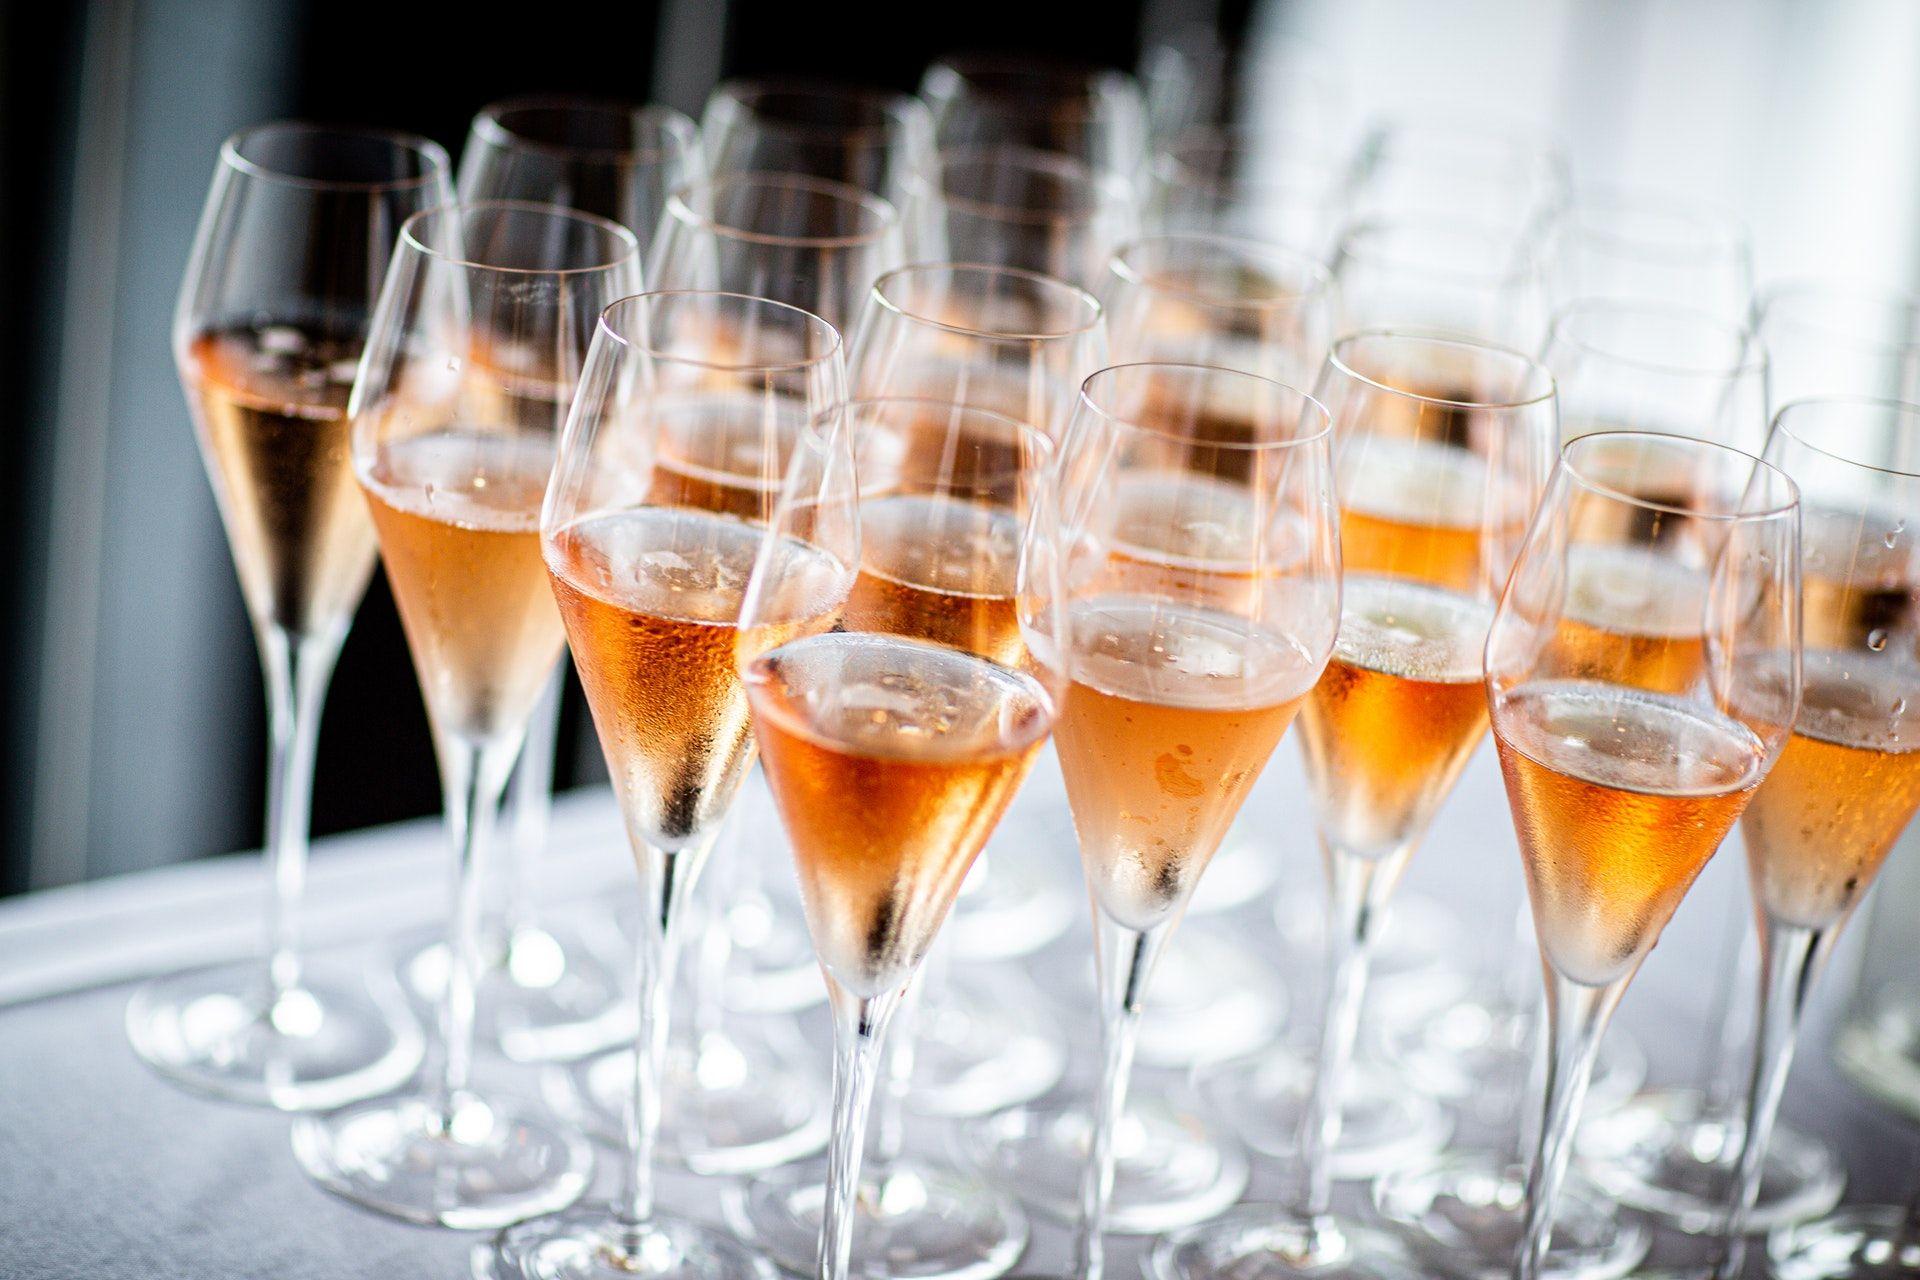 Wine glasses on table; WSET 3 topics